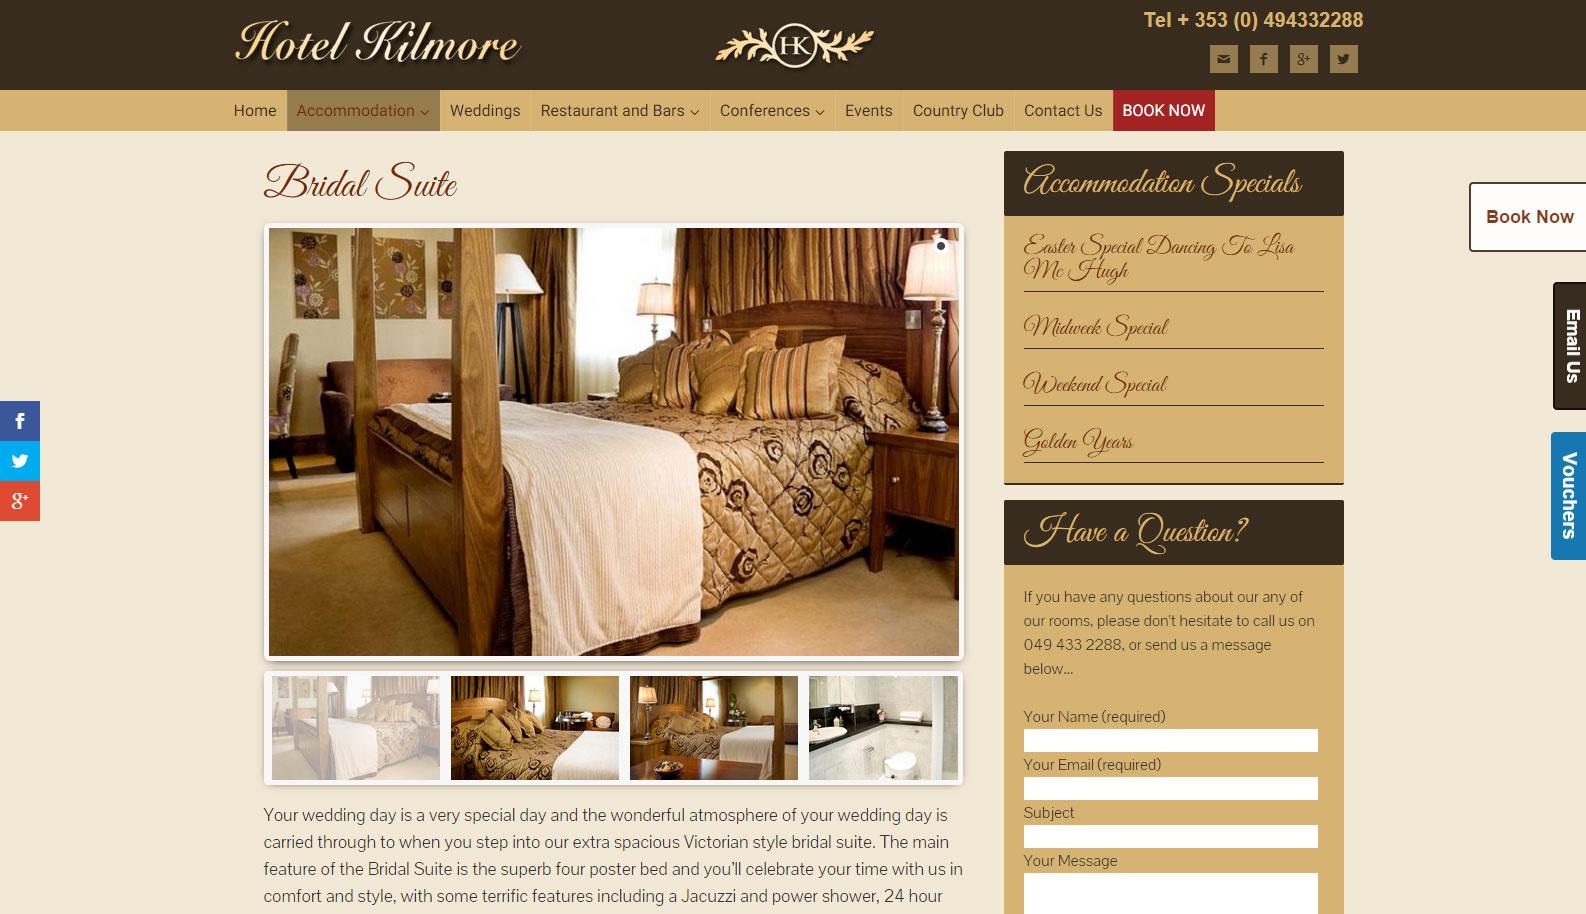 Hotel Kilmore Cavan Mobile Responsive Redesign Website